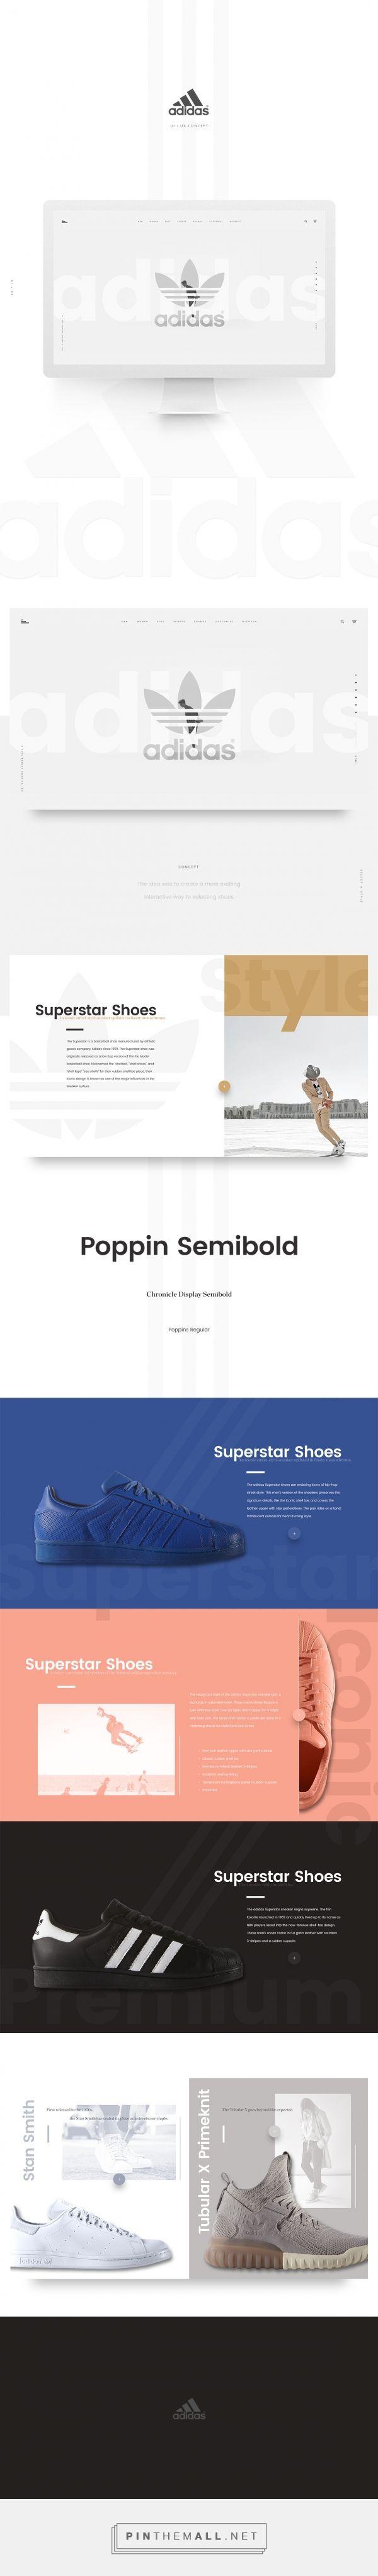 Adidas Re-Design on Behance - created via https://pinthemall.net